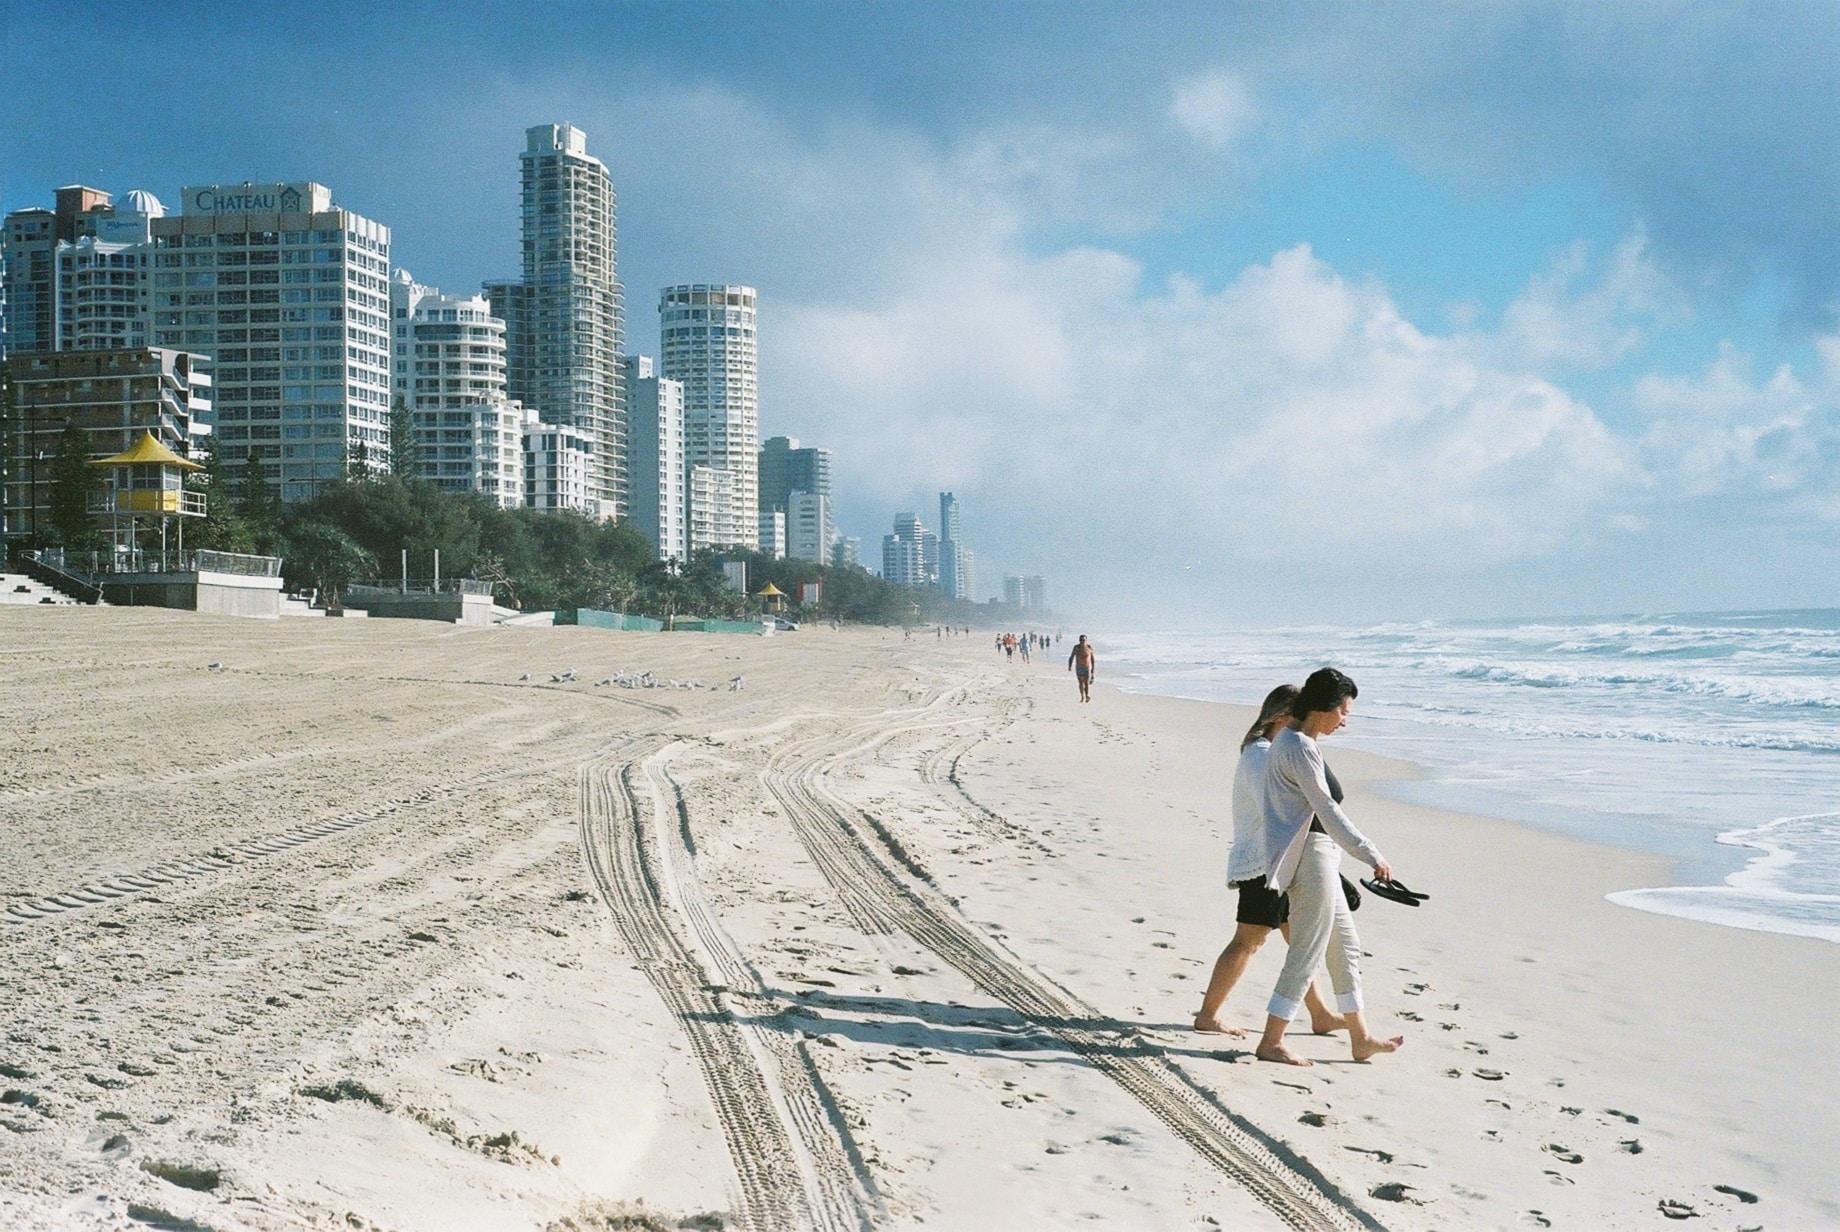 people walking on seashore near concrete buildings during daytime